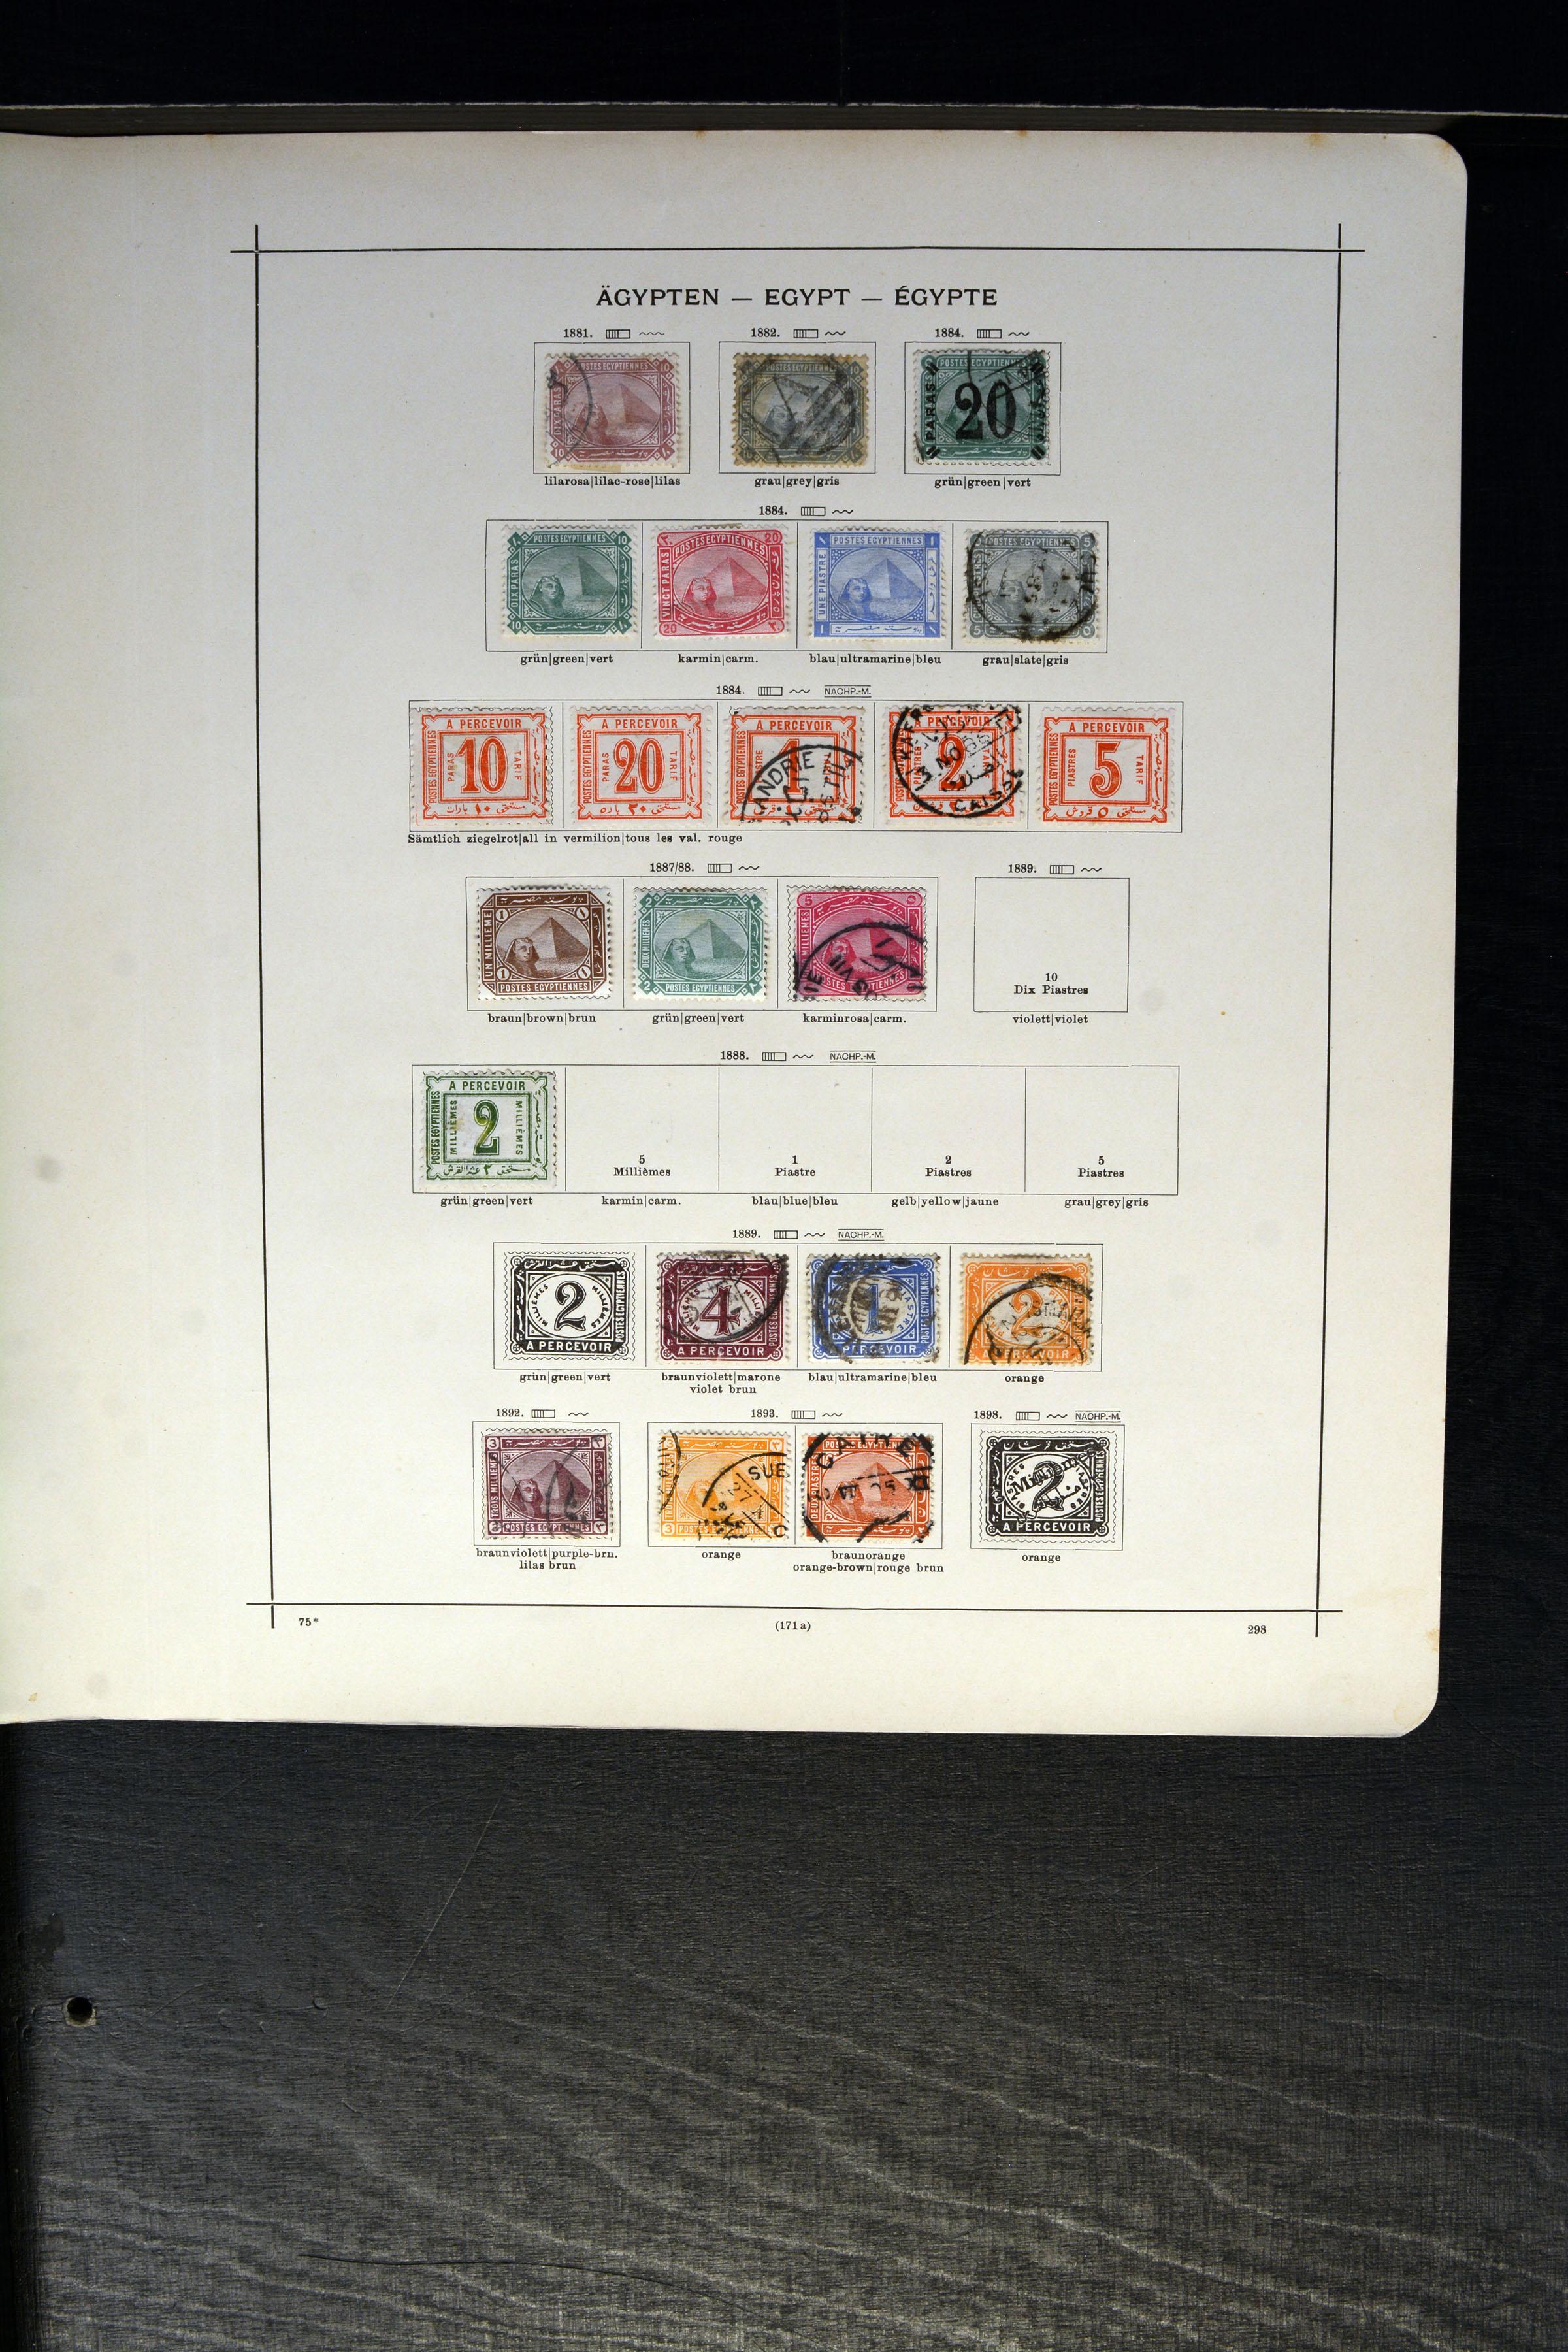 Heinrich Koehler Auctions Gmbh Co Kg Sale 367 Page 195